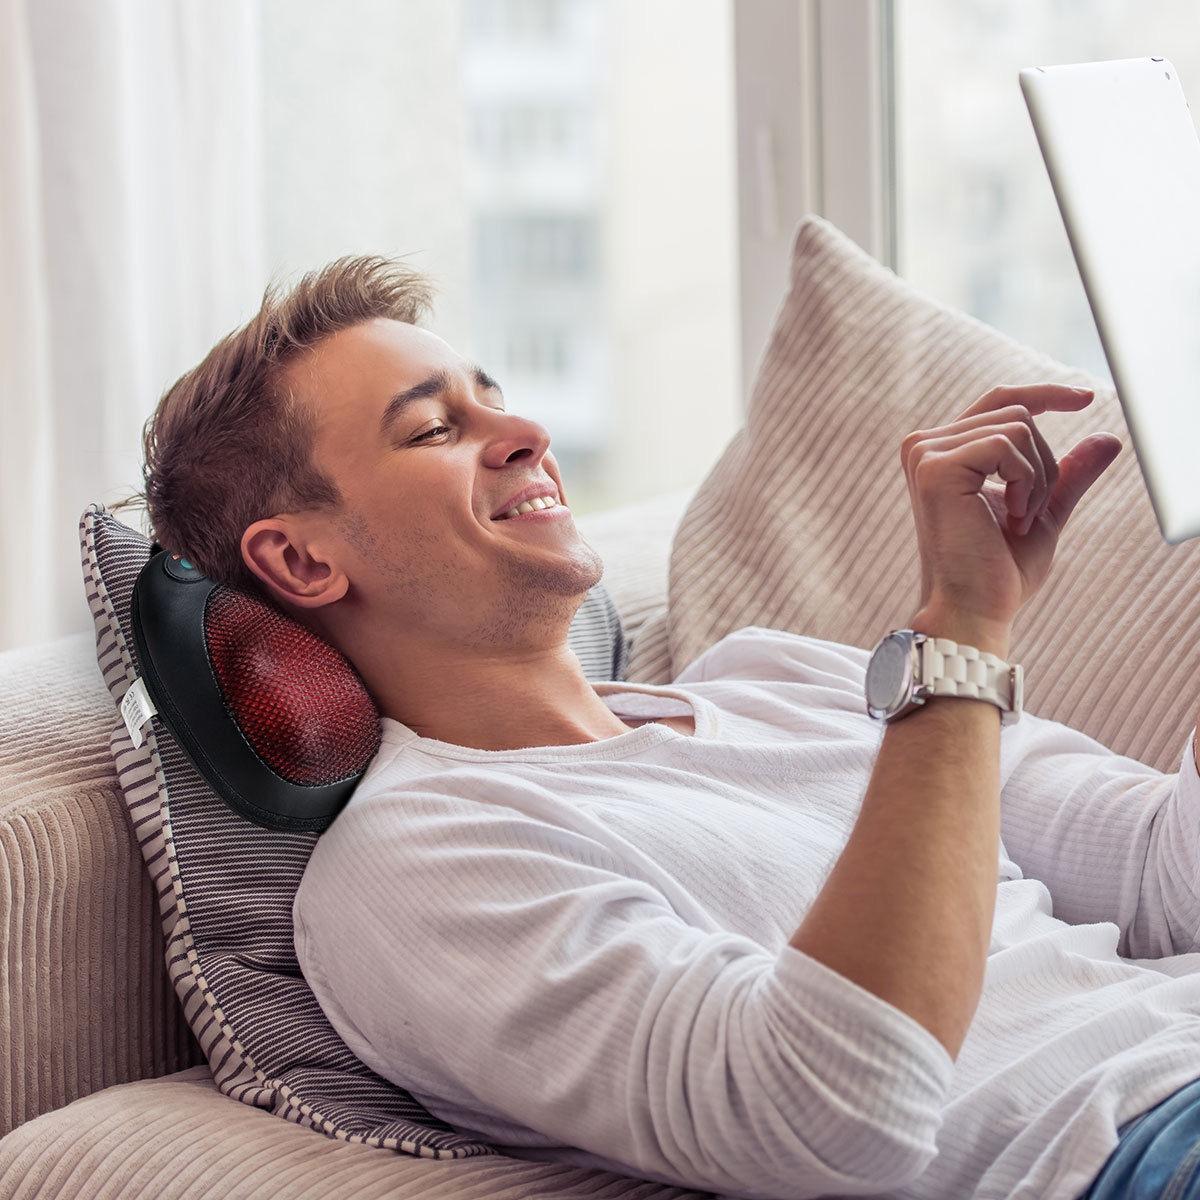 Man using shiatsu pillow massager